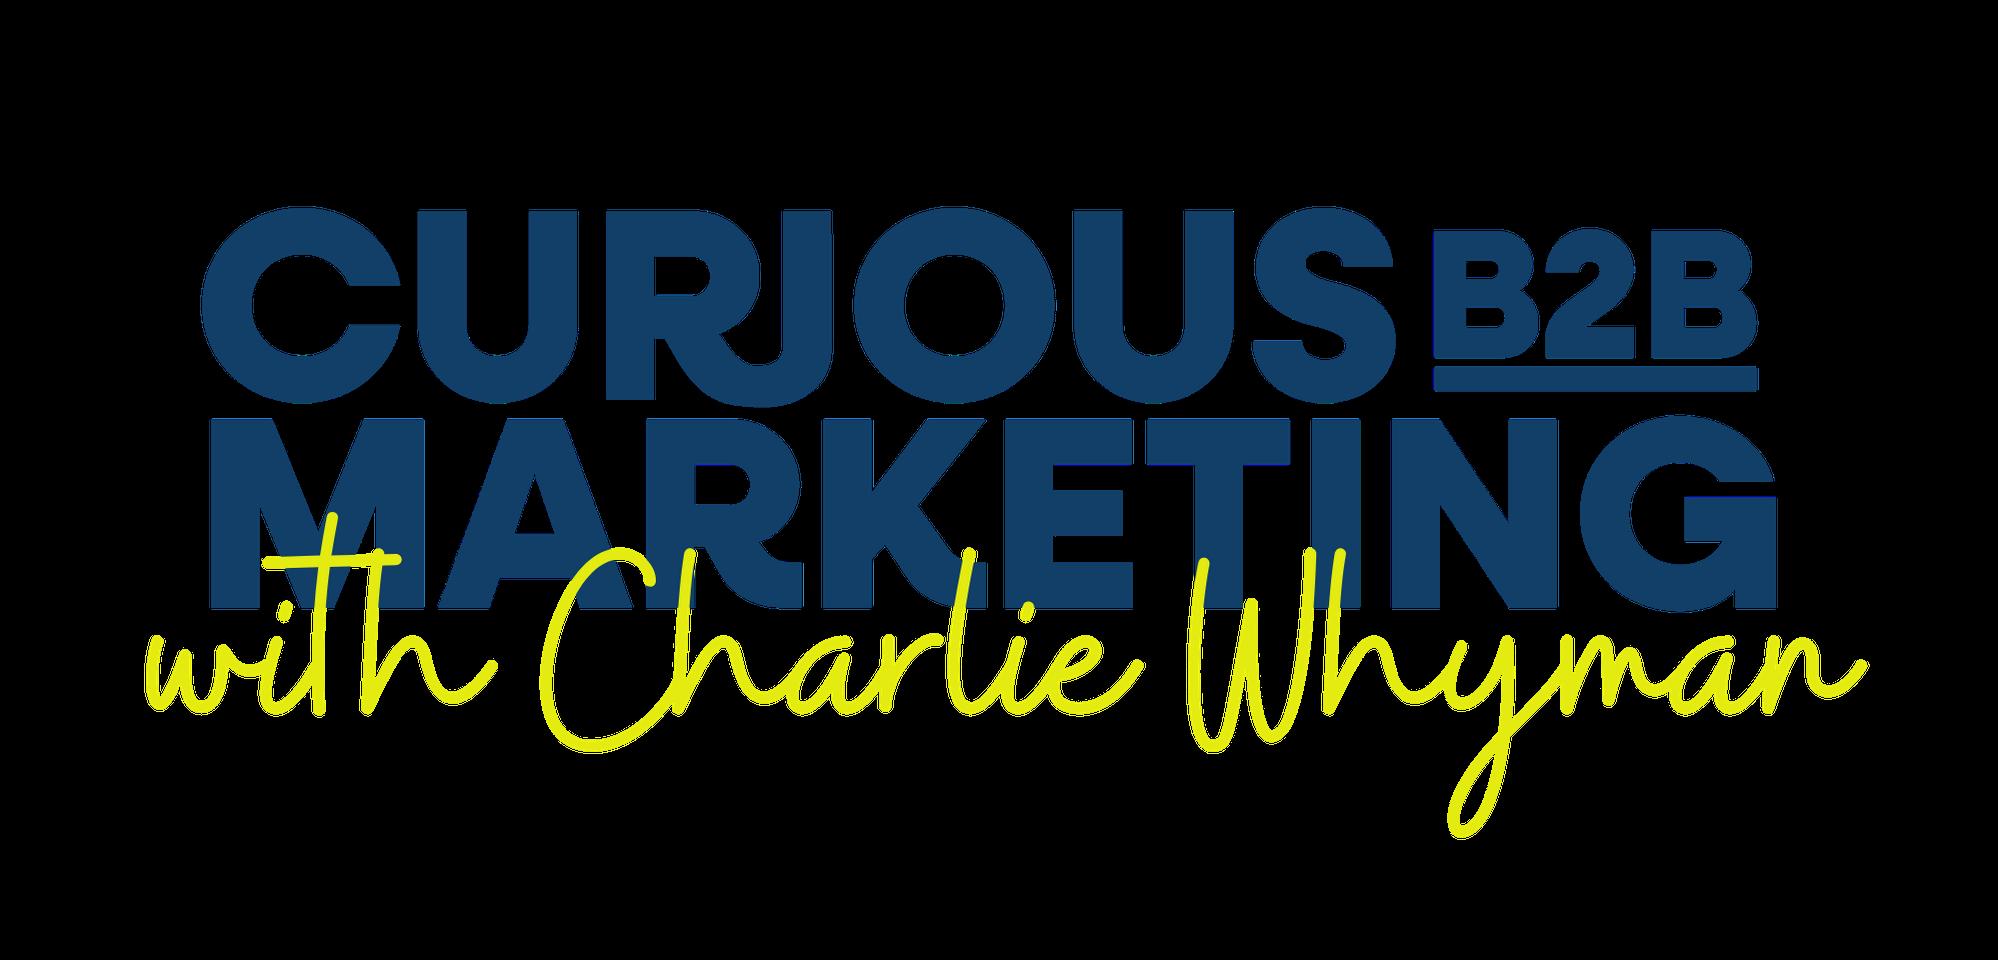 Curious B2B Marketing